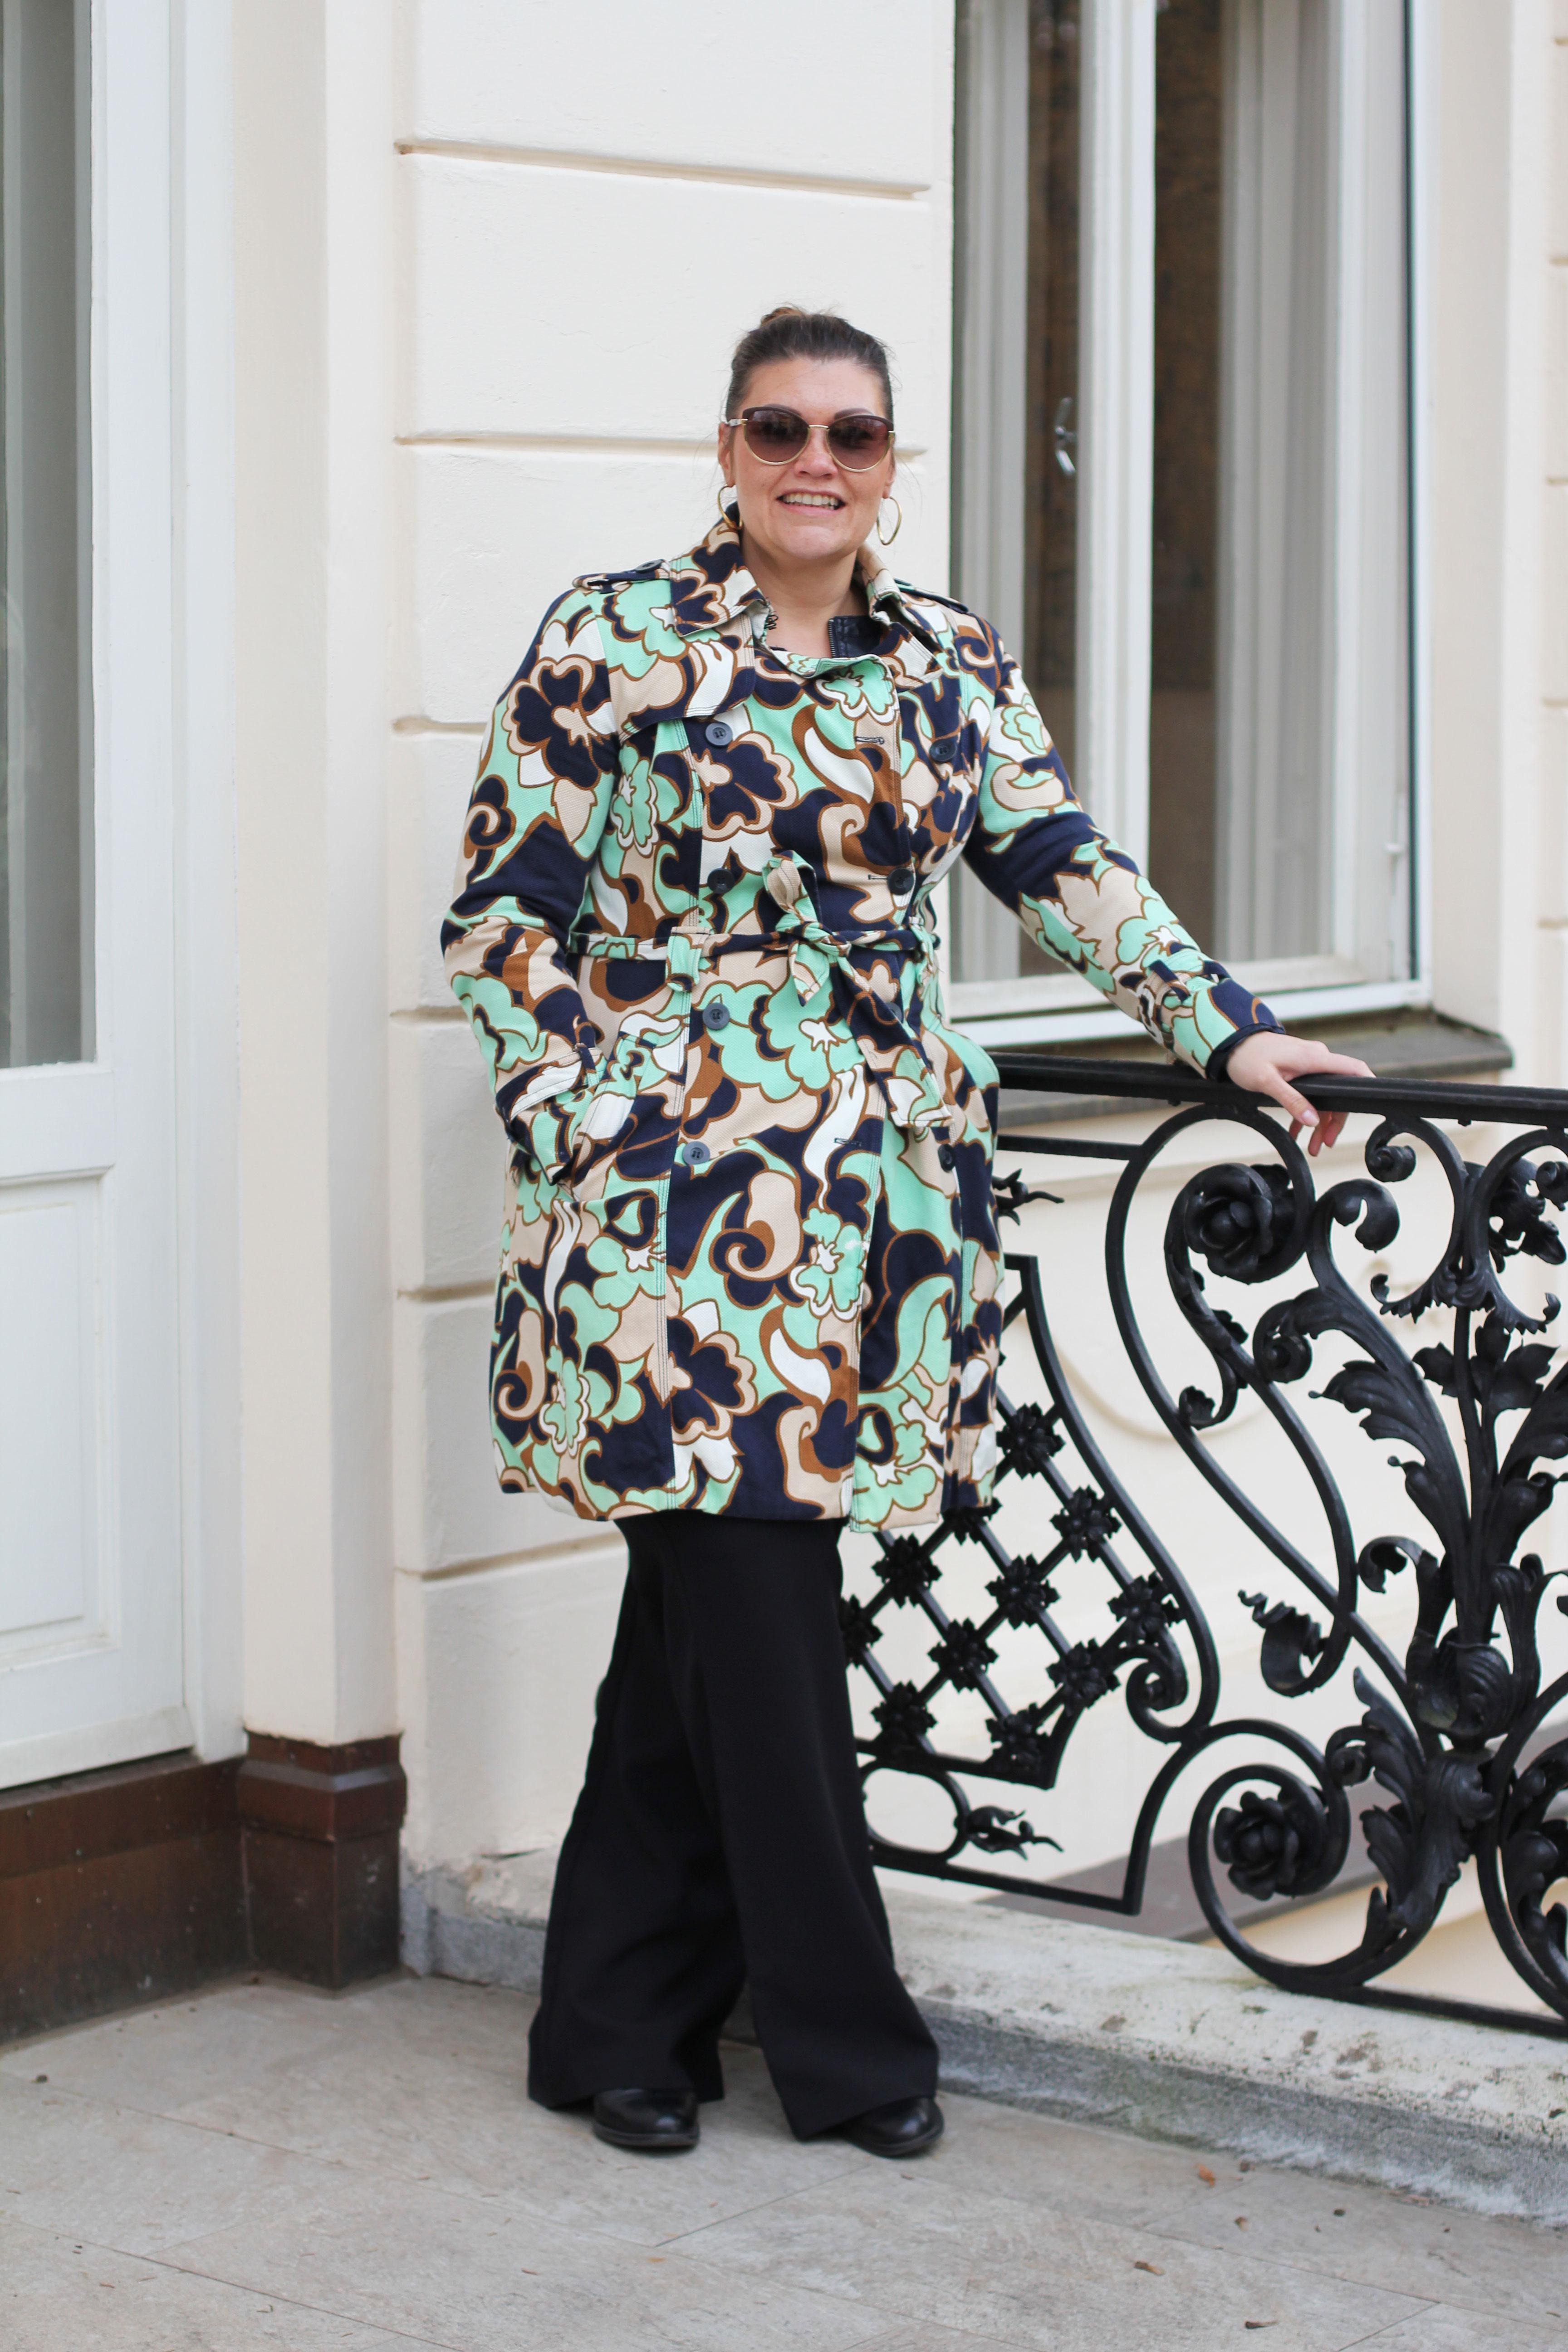 klimt-villa-blumenmuster-mantel-coat-wempe--greenery-kardiaserena-fashion-outfit-plussize-austrianblogger-plussizeblogger